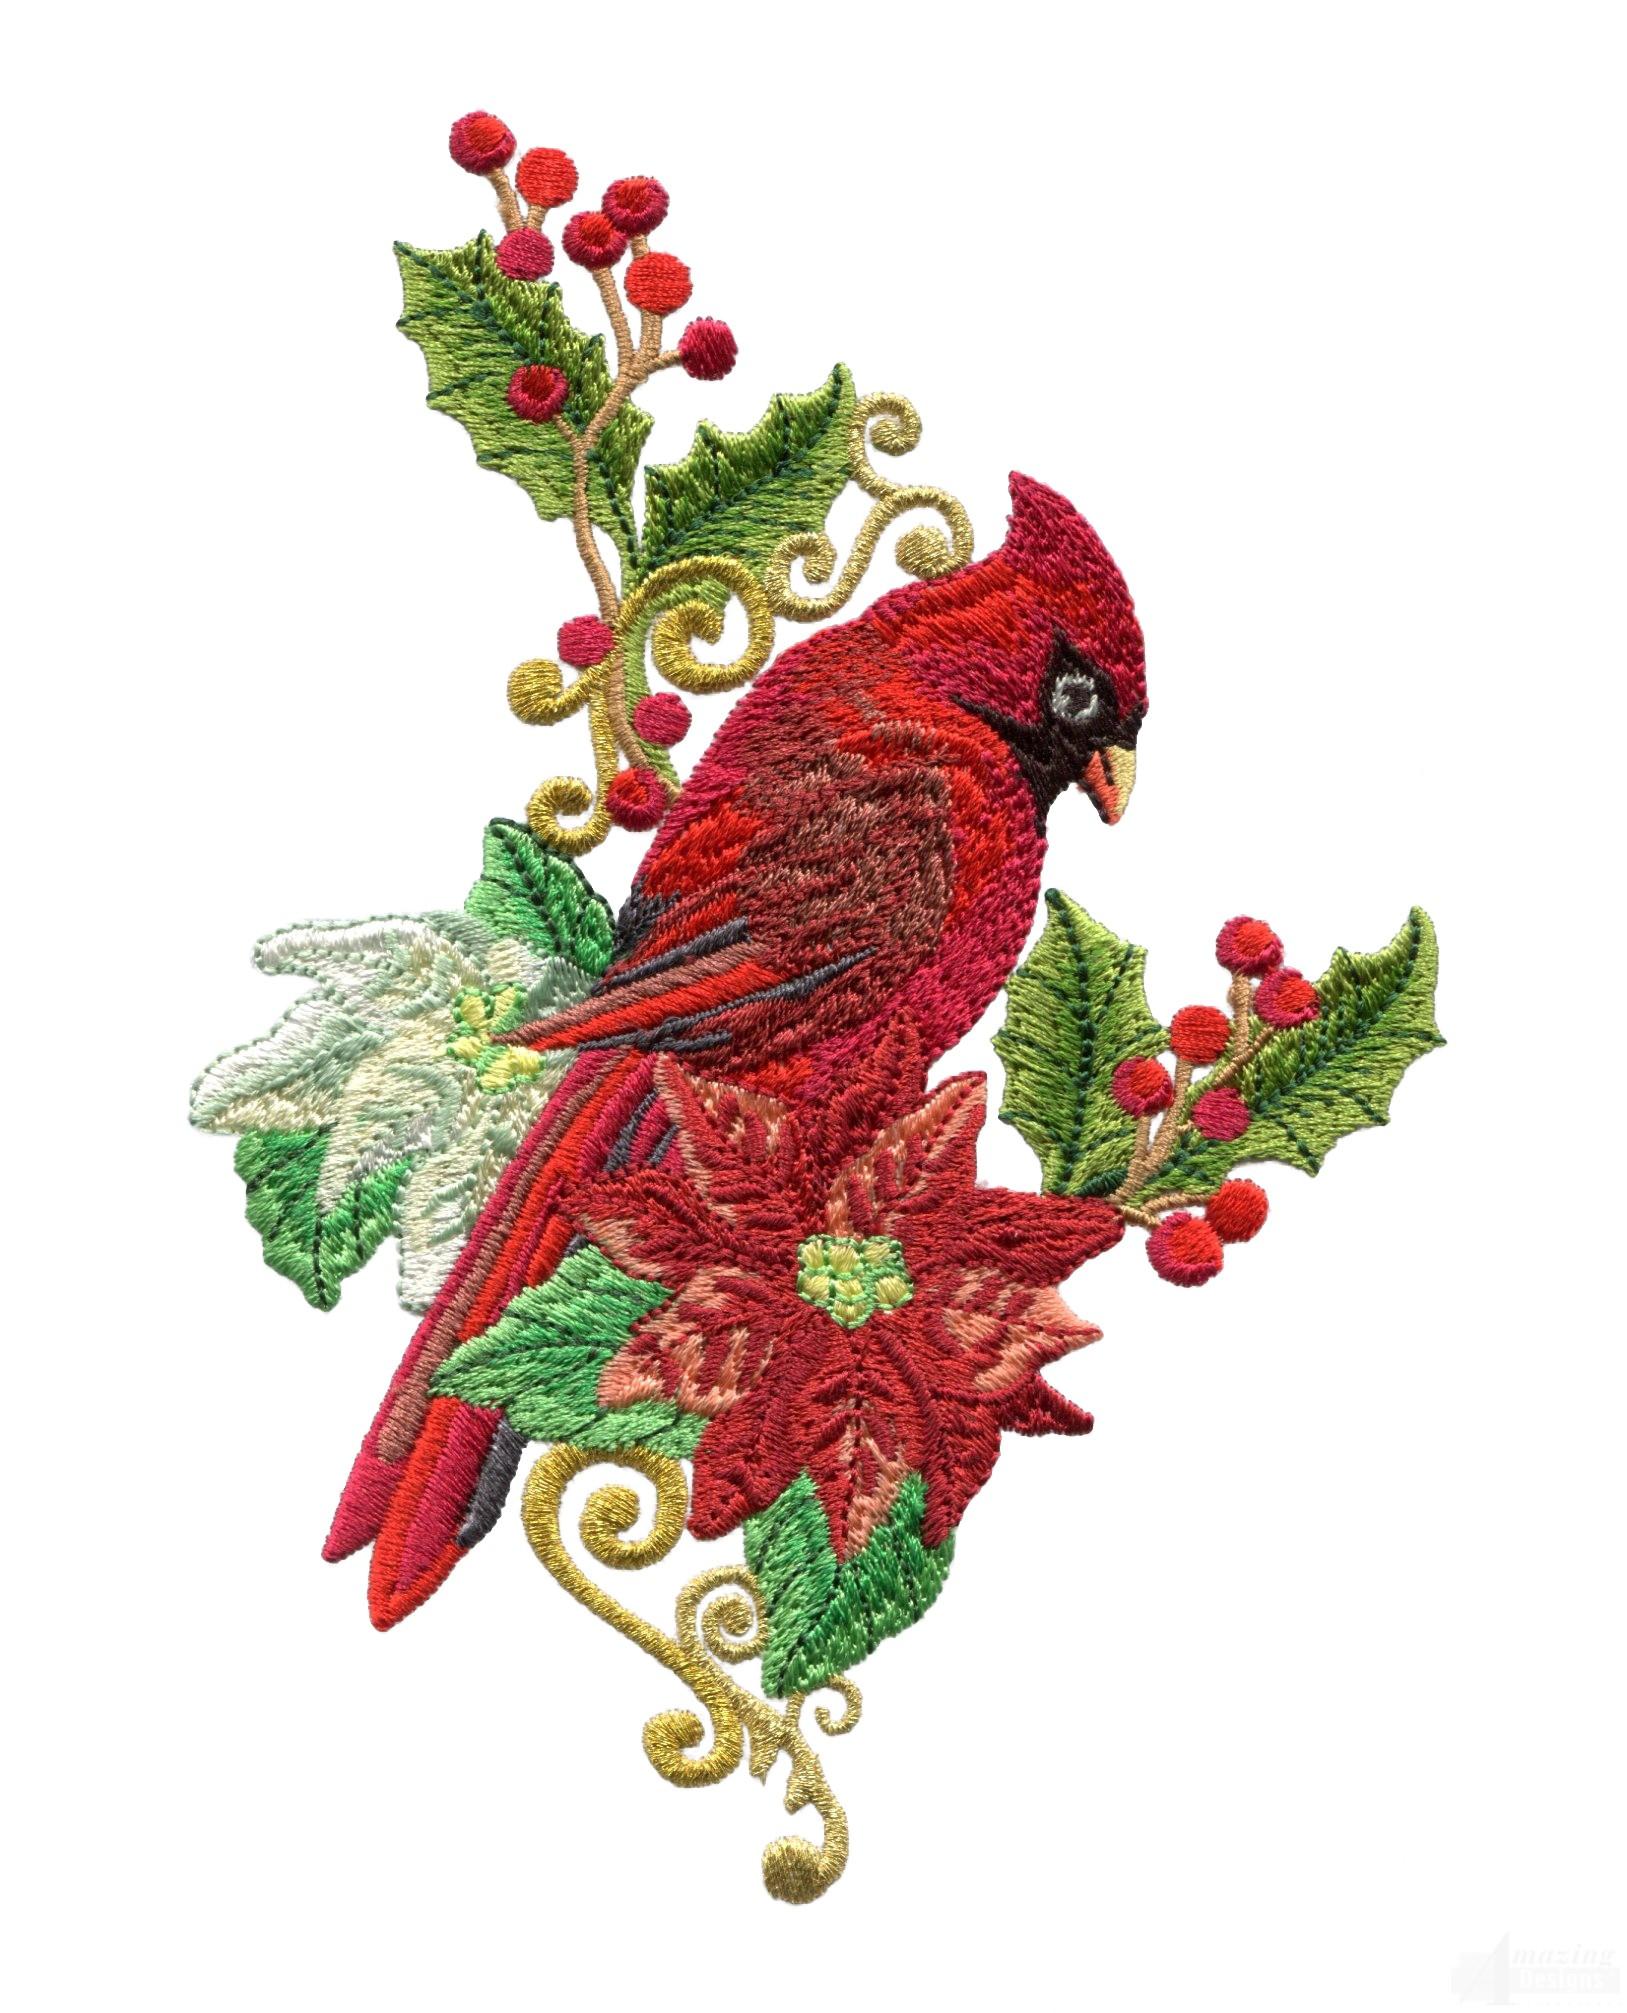 swnrcc127 regal cardinal embroidery design. Black Bedroom Furniture Sets. Home Design Ideas